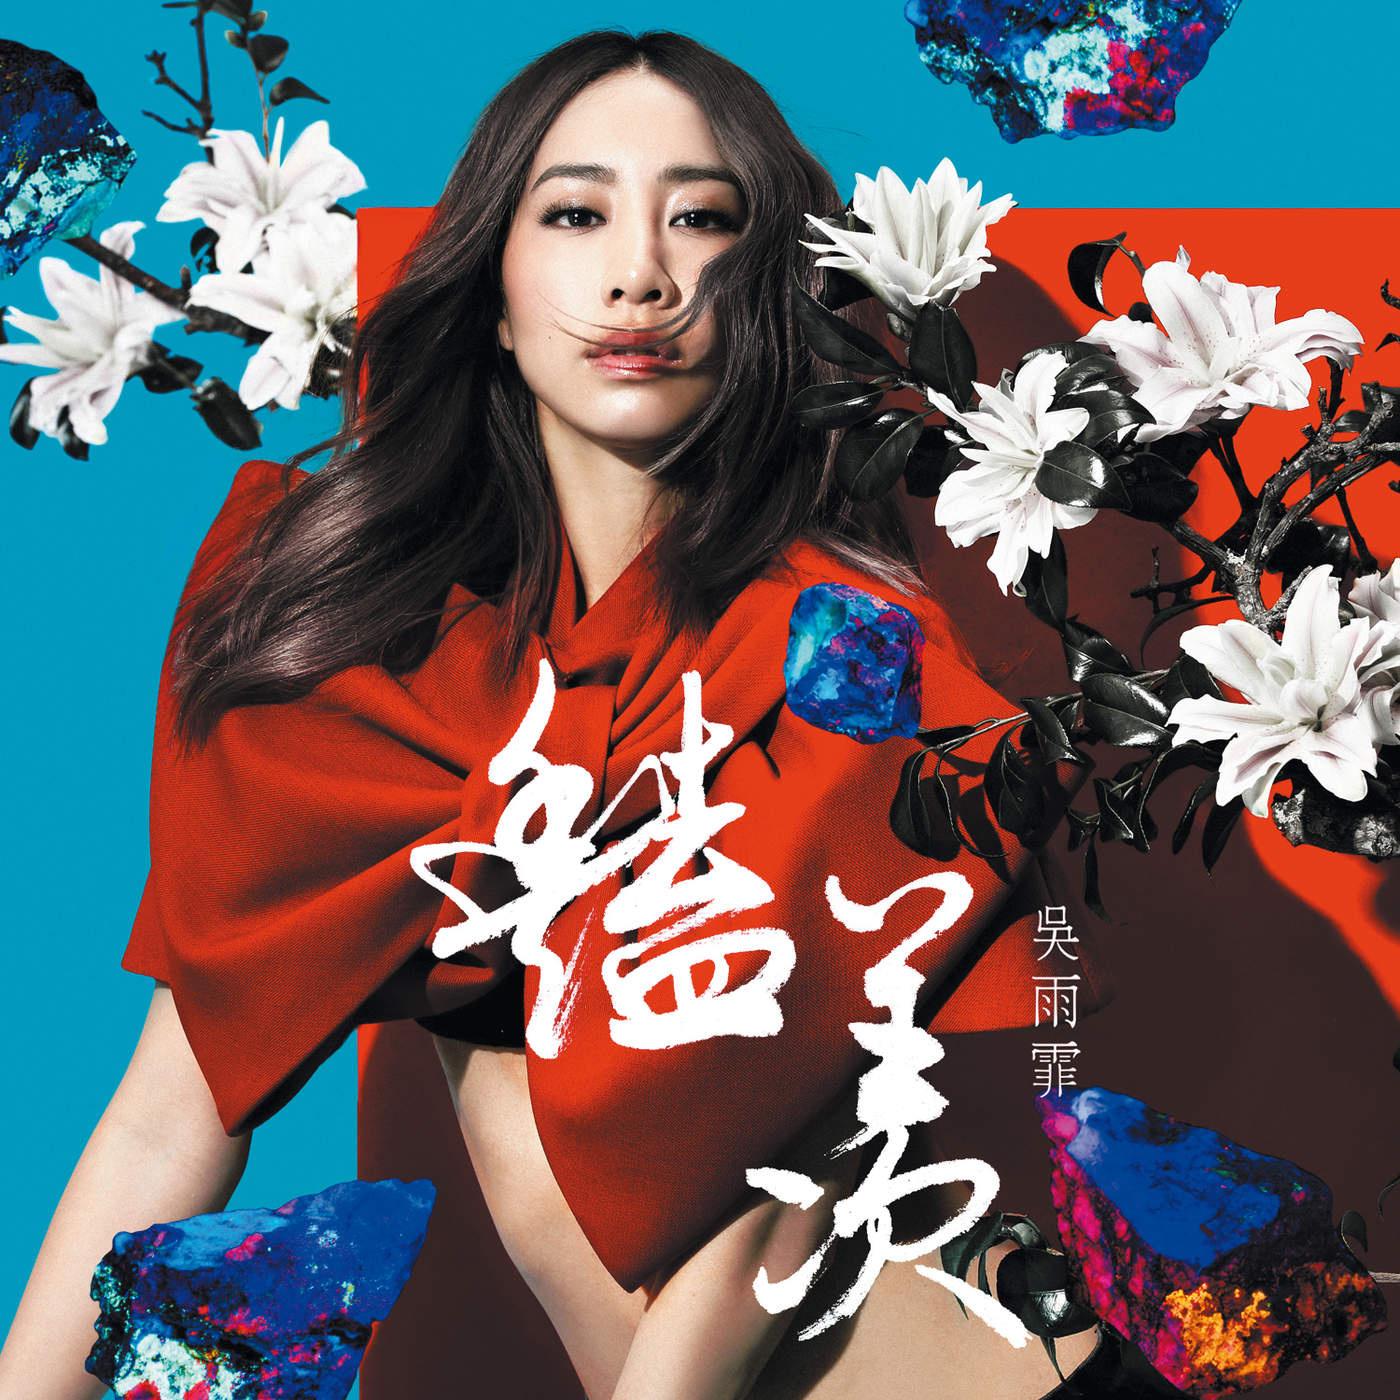 [Album] 艷羨 / Glamorous - 吳雨霏 / Kary Ng